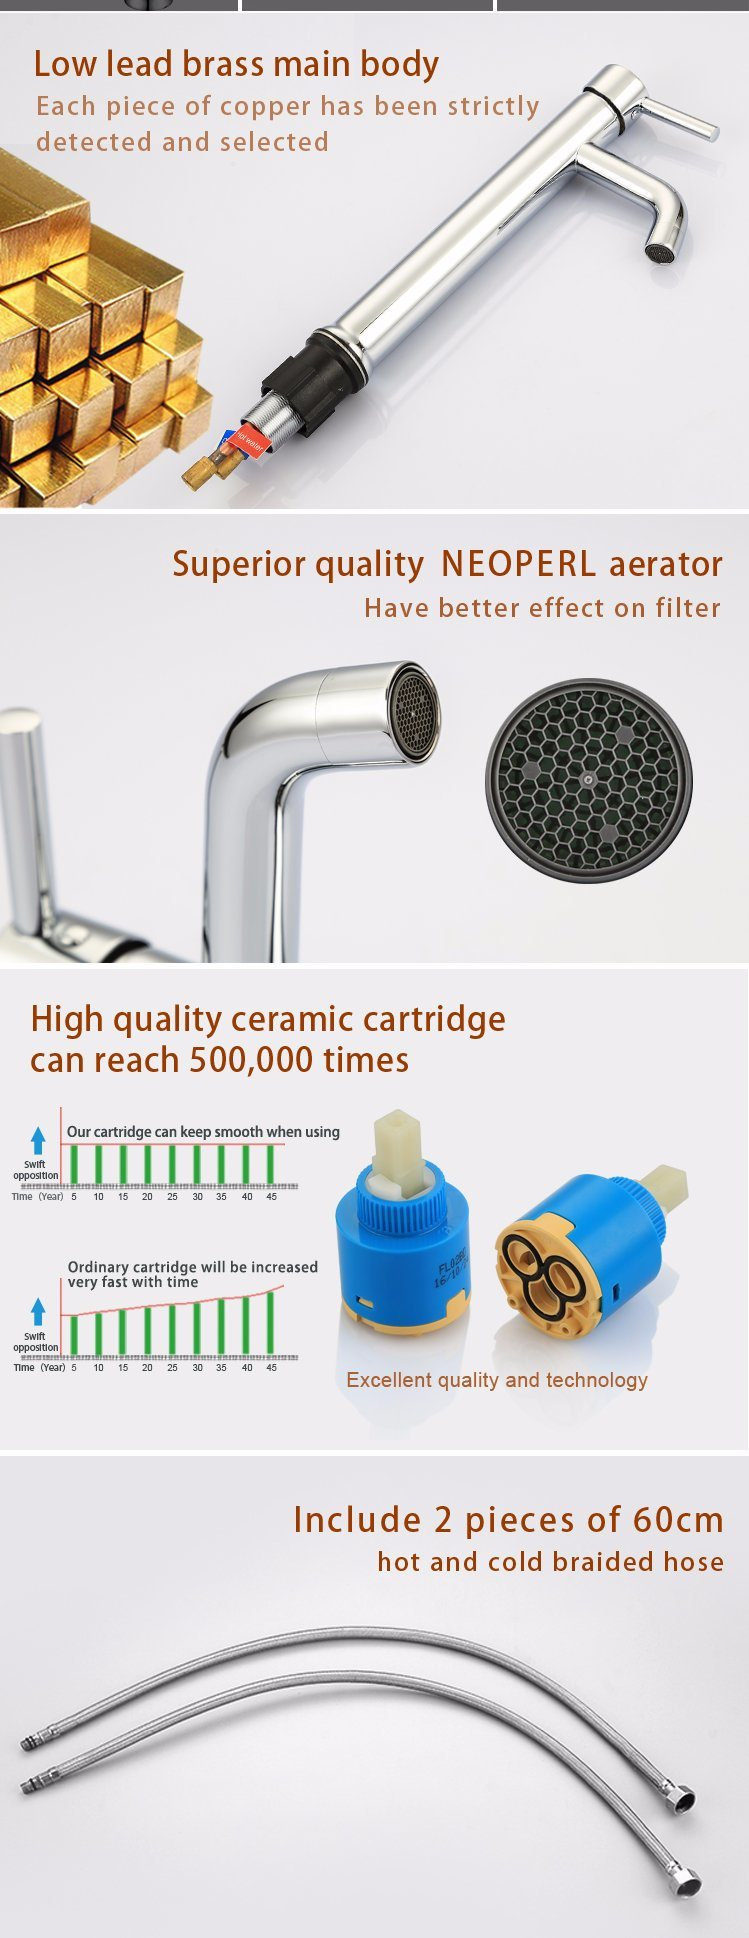 High End Chrome Bathroom Faucet, Bathroom Accessories Brass for Wholesale